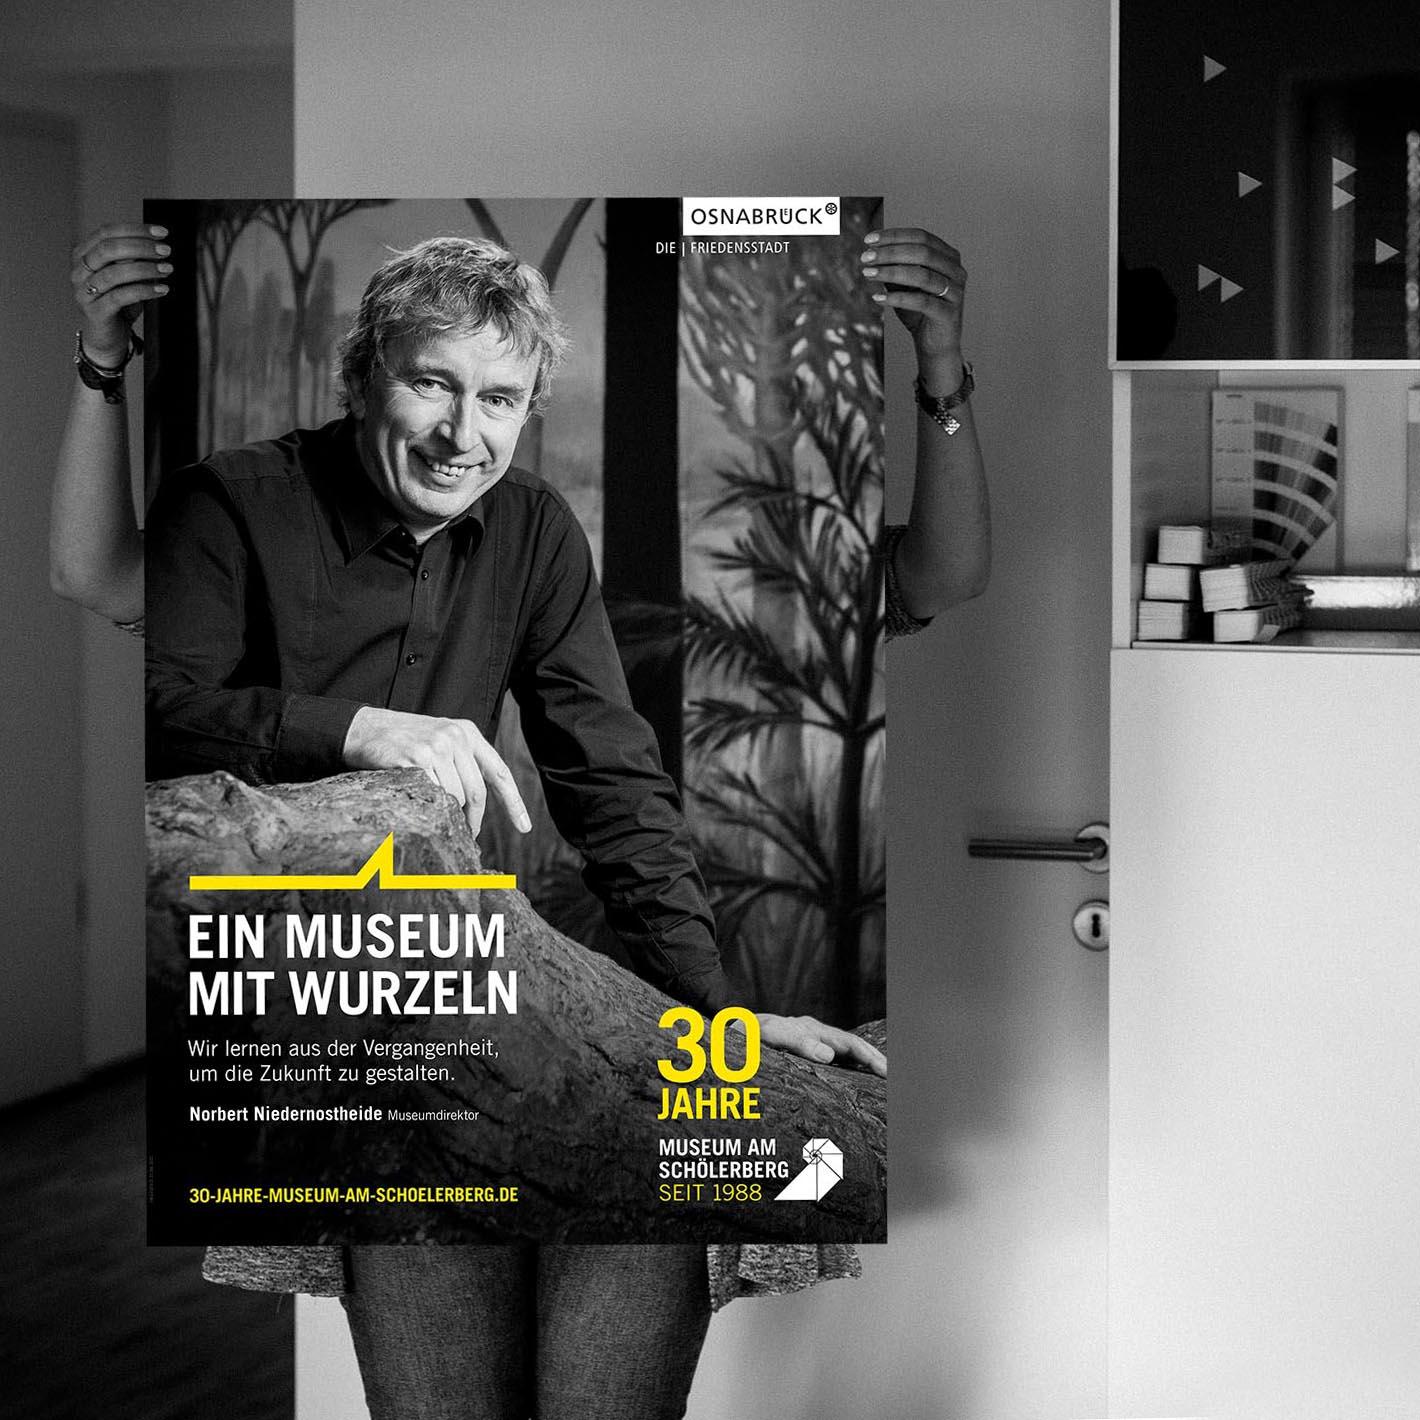 grafikdesign und wordpress hasegold osnabr ck. Black Bedroom Furniture Sets. Home Design Ideas